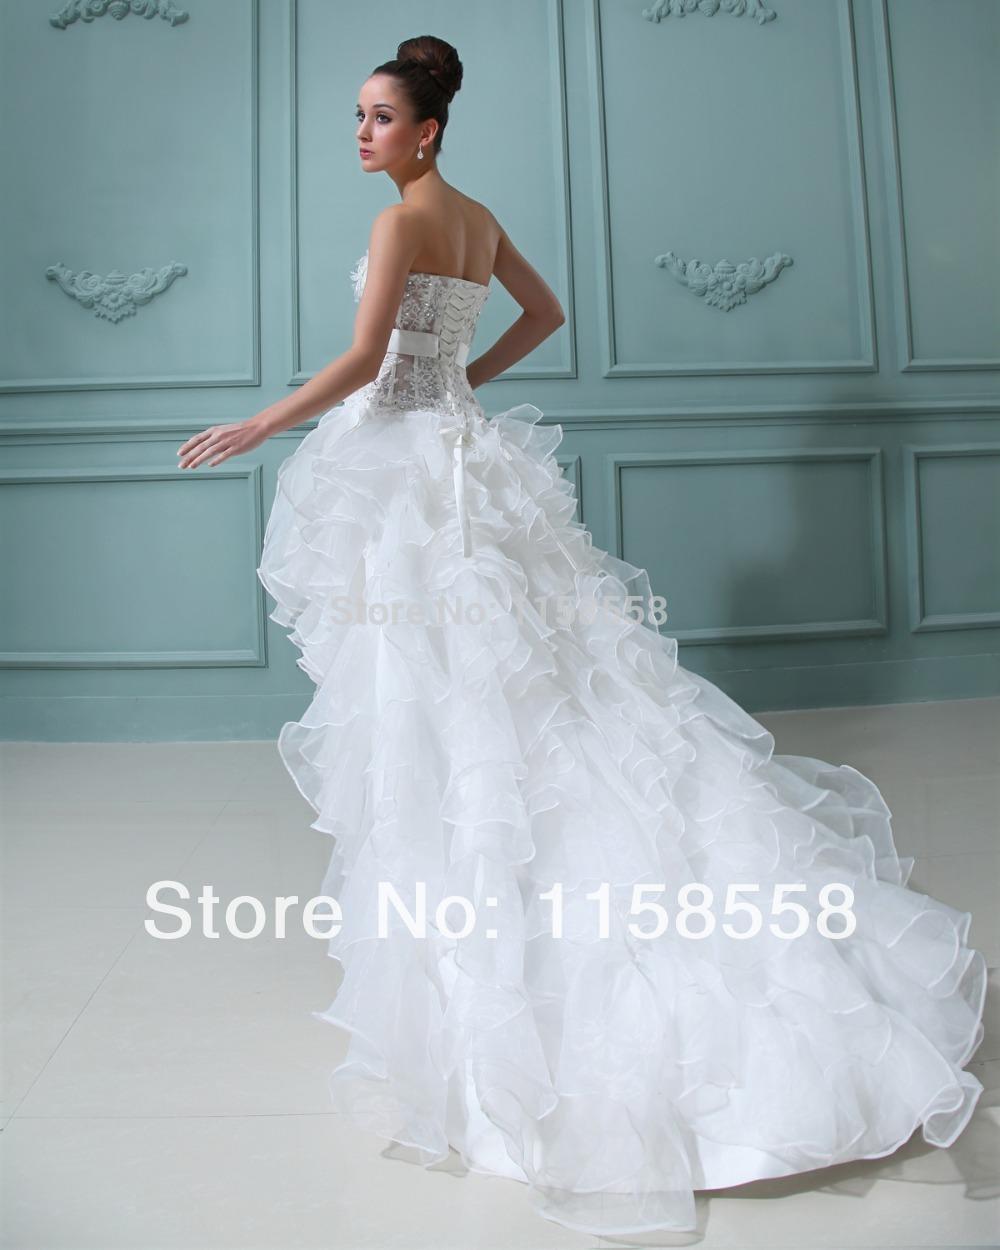 Wedding Dress Hire Uk Surrey Dresses Asian